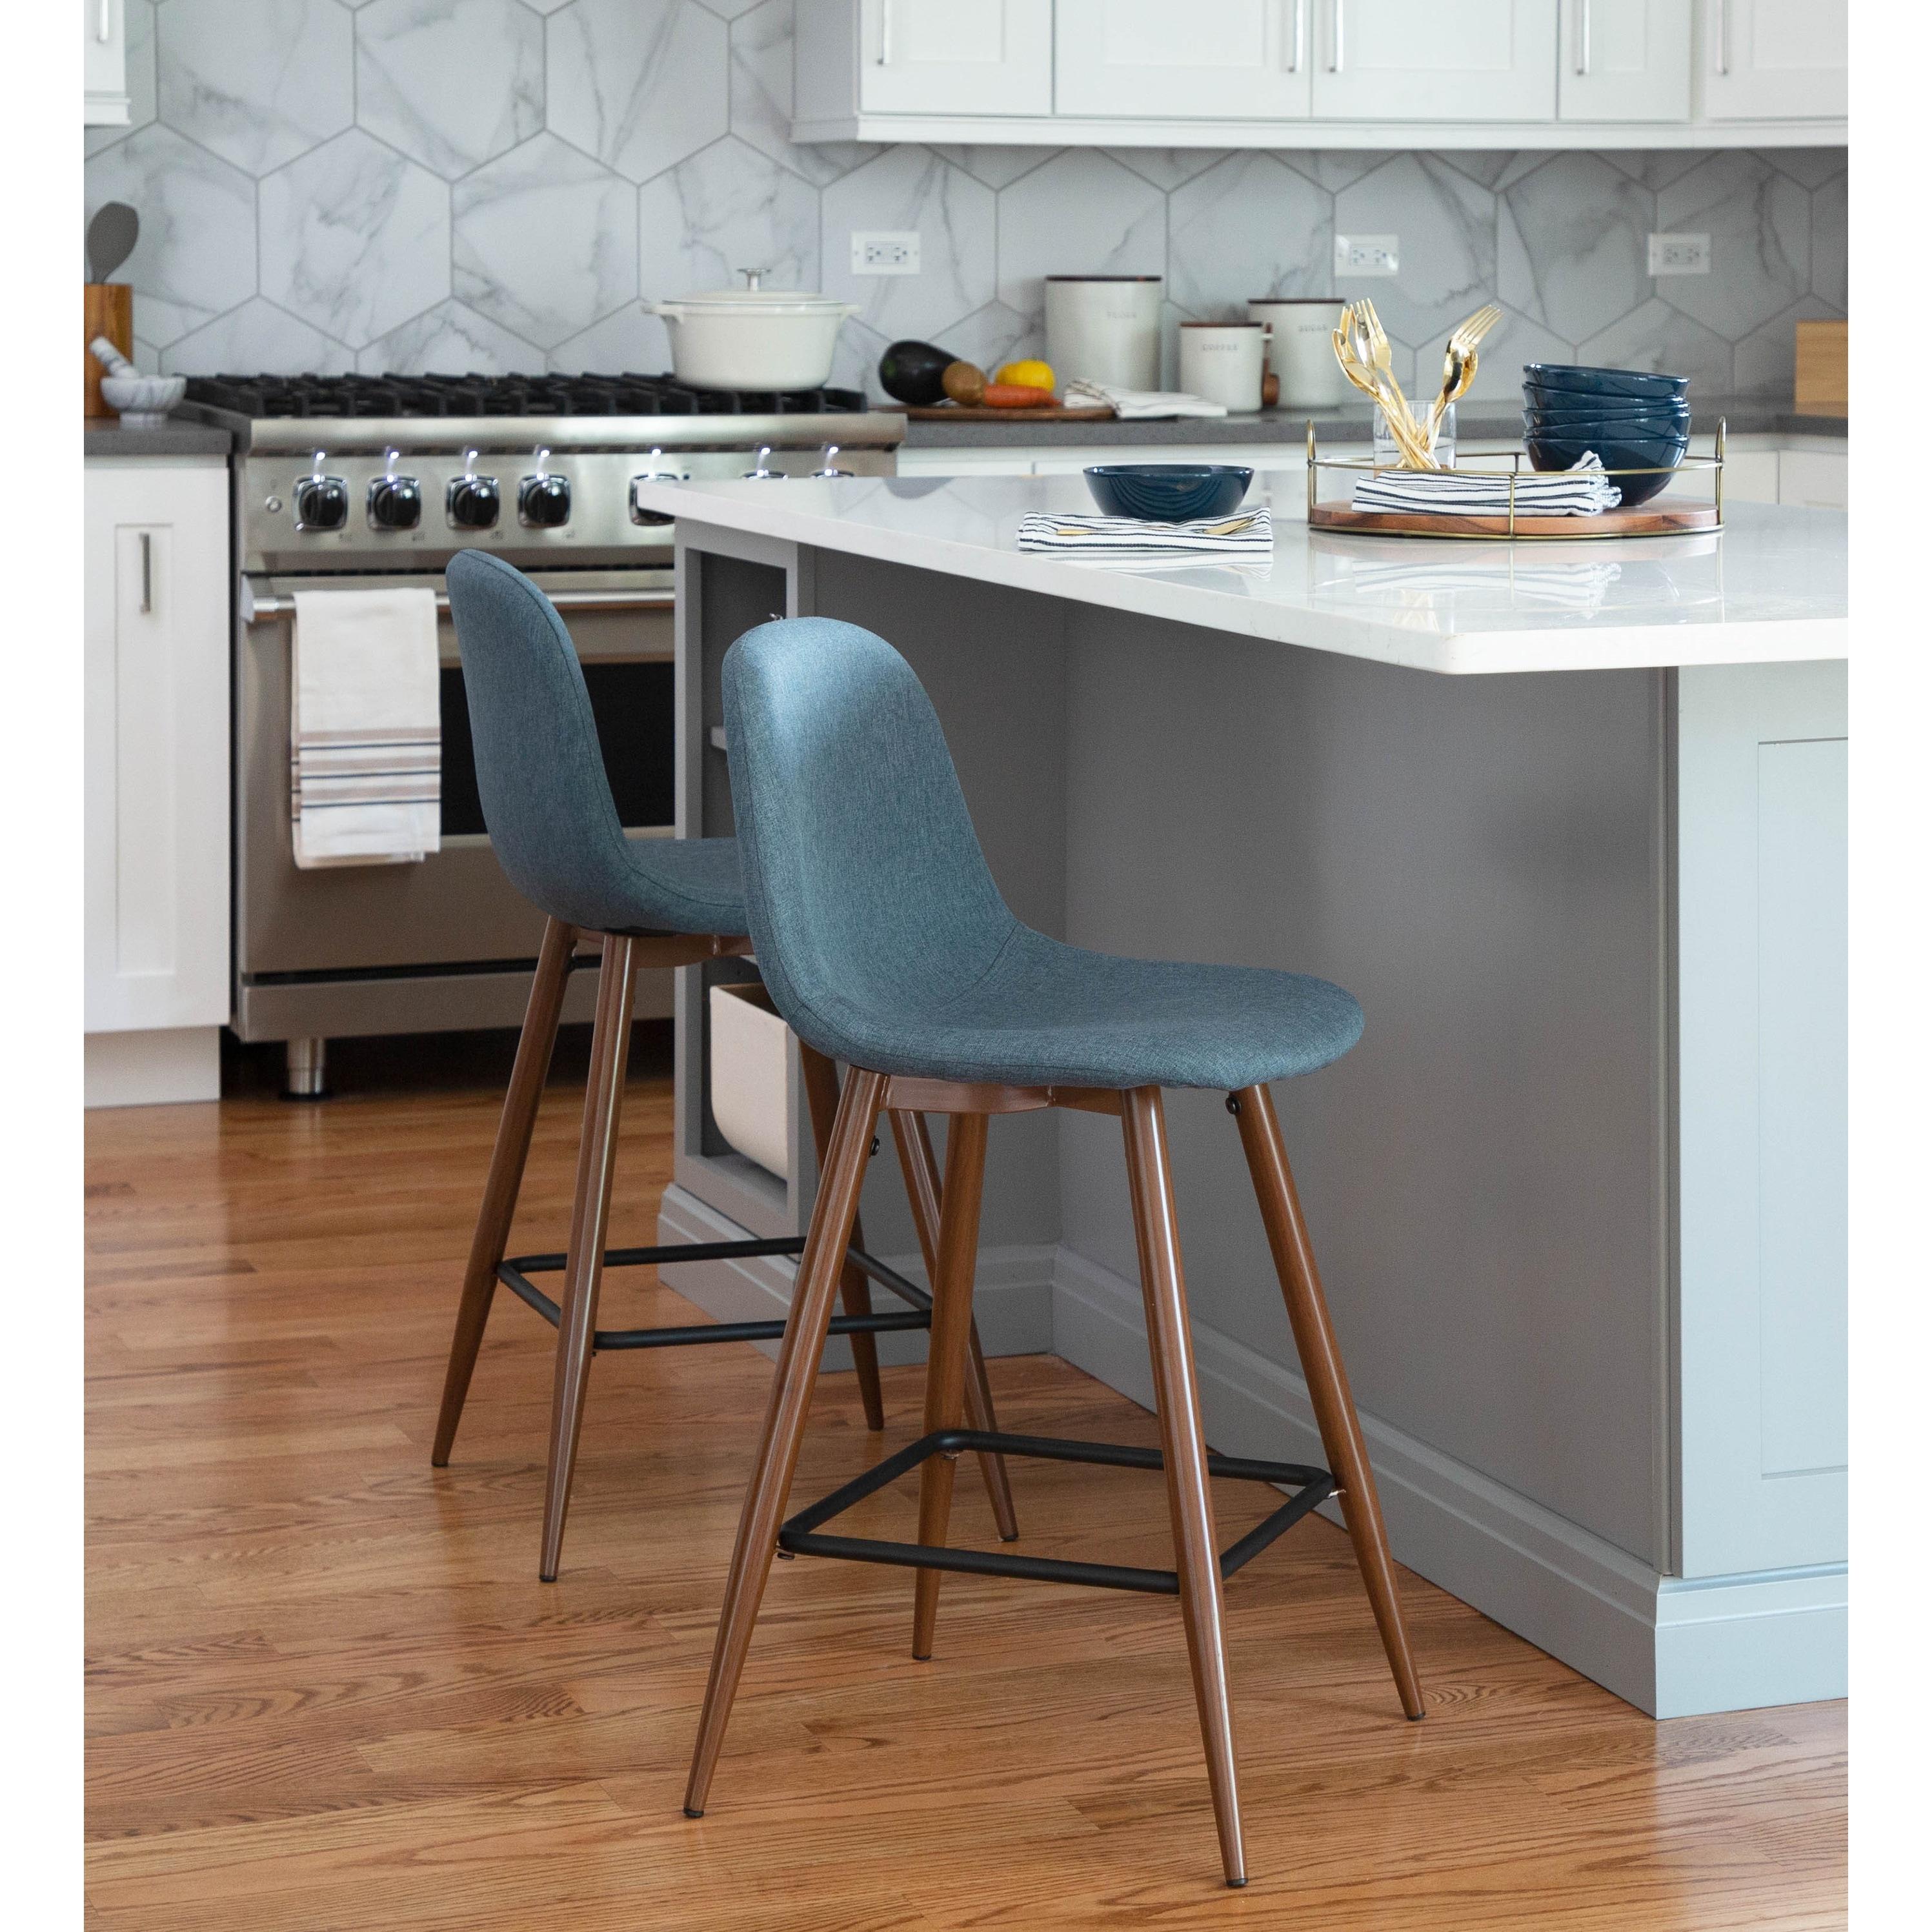 Pebble Mid Century Modern Upholstered Kitchen Counter Stool Set ...